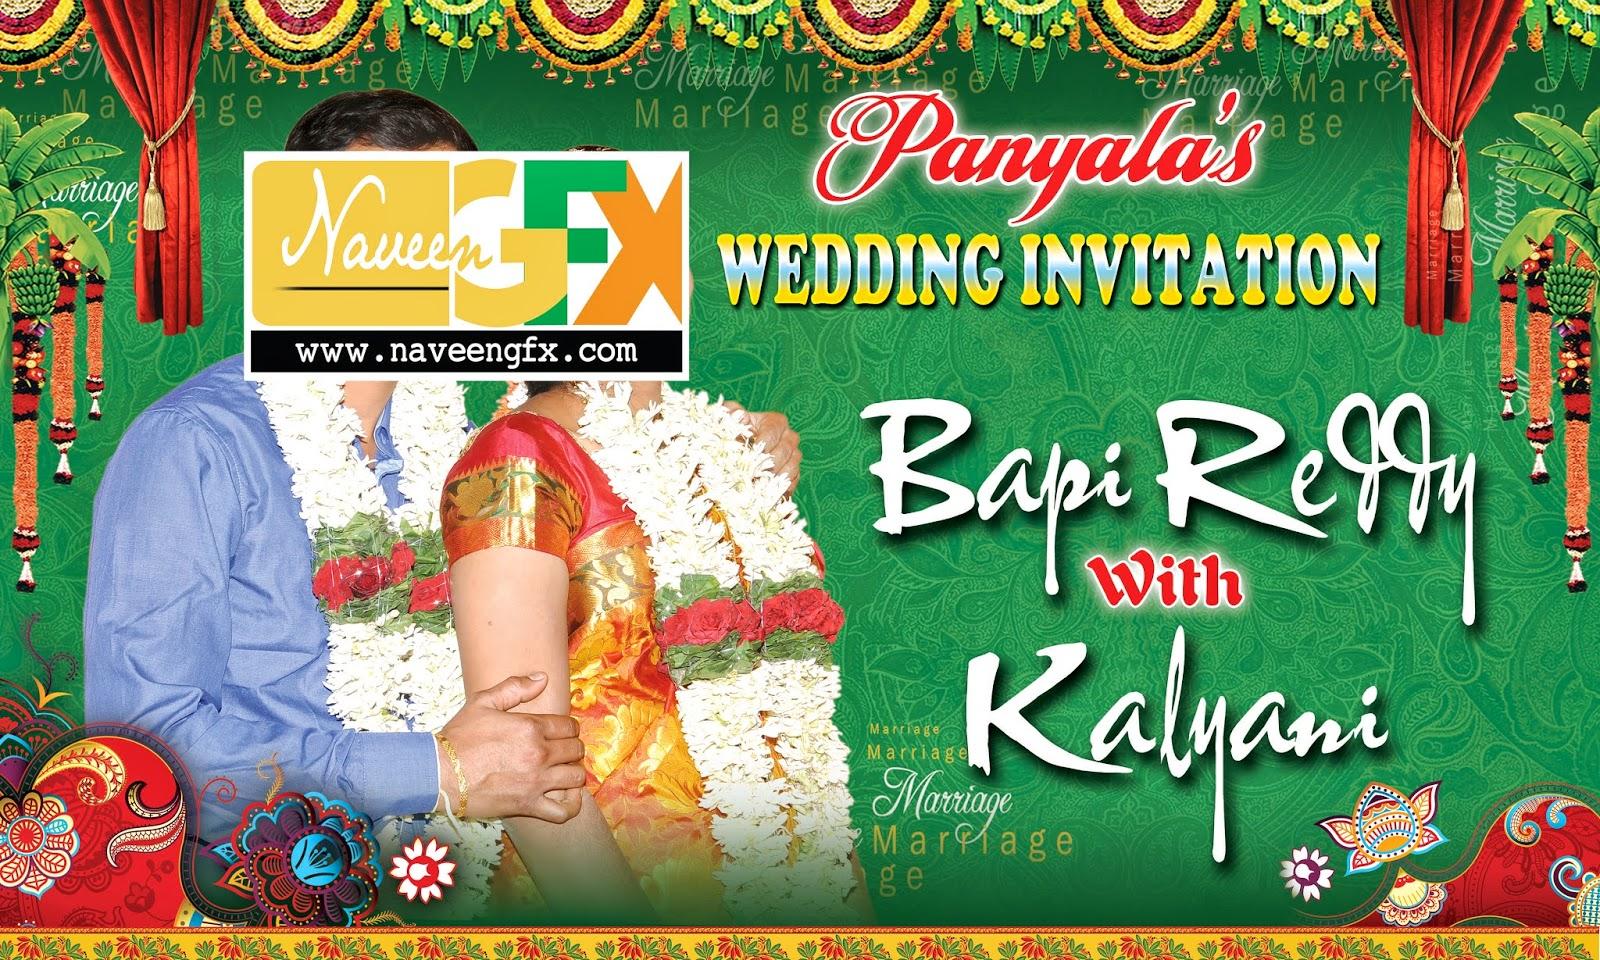 Indian Wedding Banner Design Indian-wedding-designed-flex